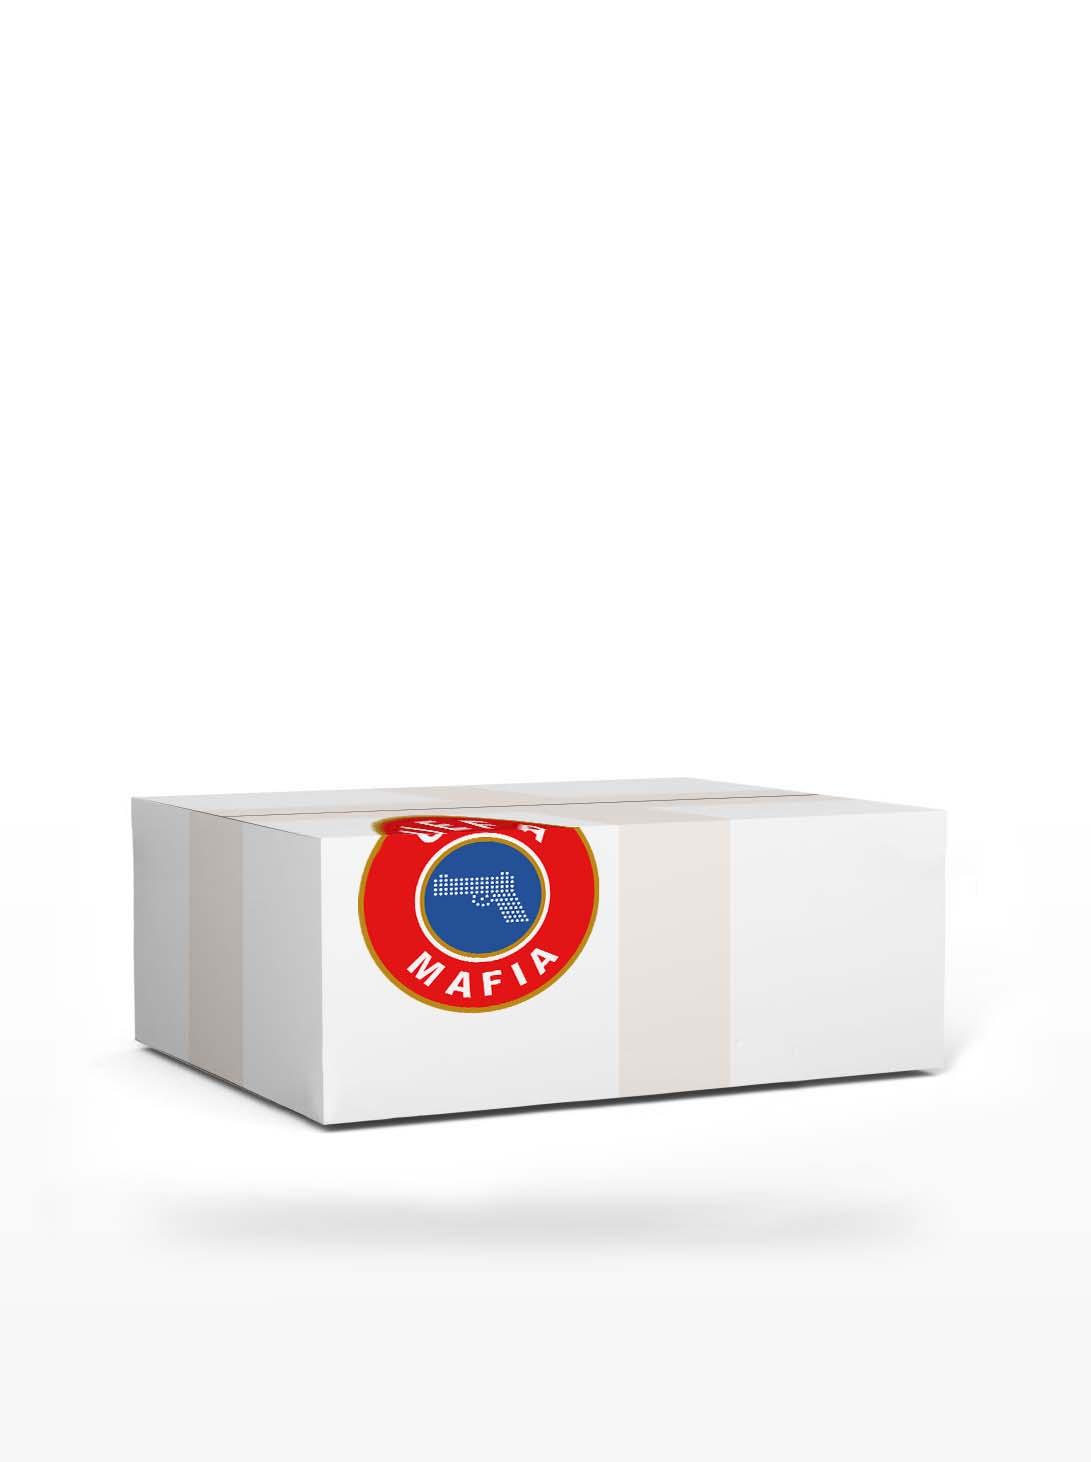 Feyenoord Europa Cup - Mysterie Box